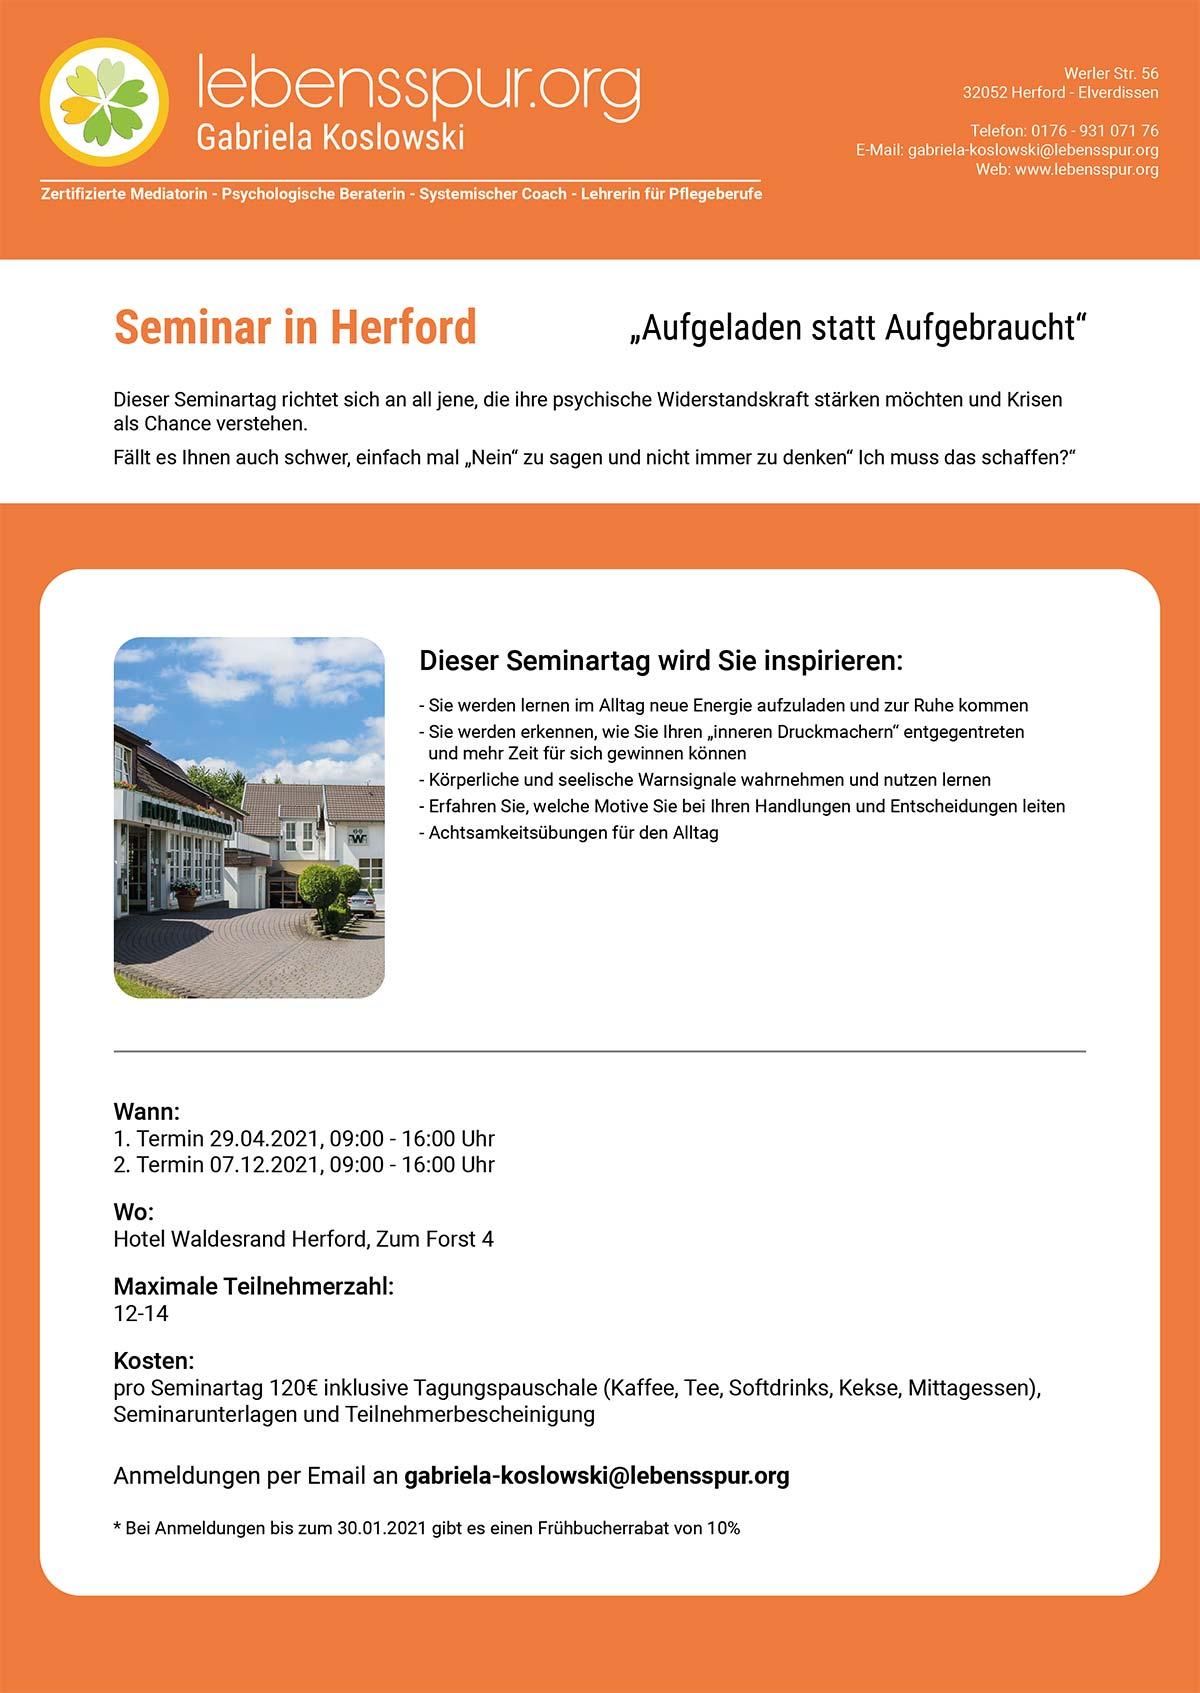 Flyer: Lebensspur.org